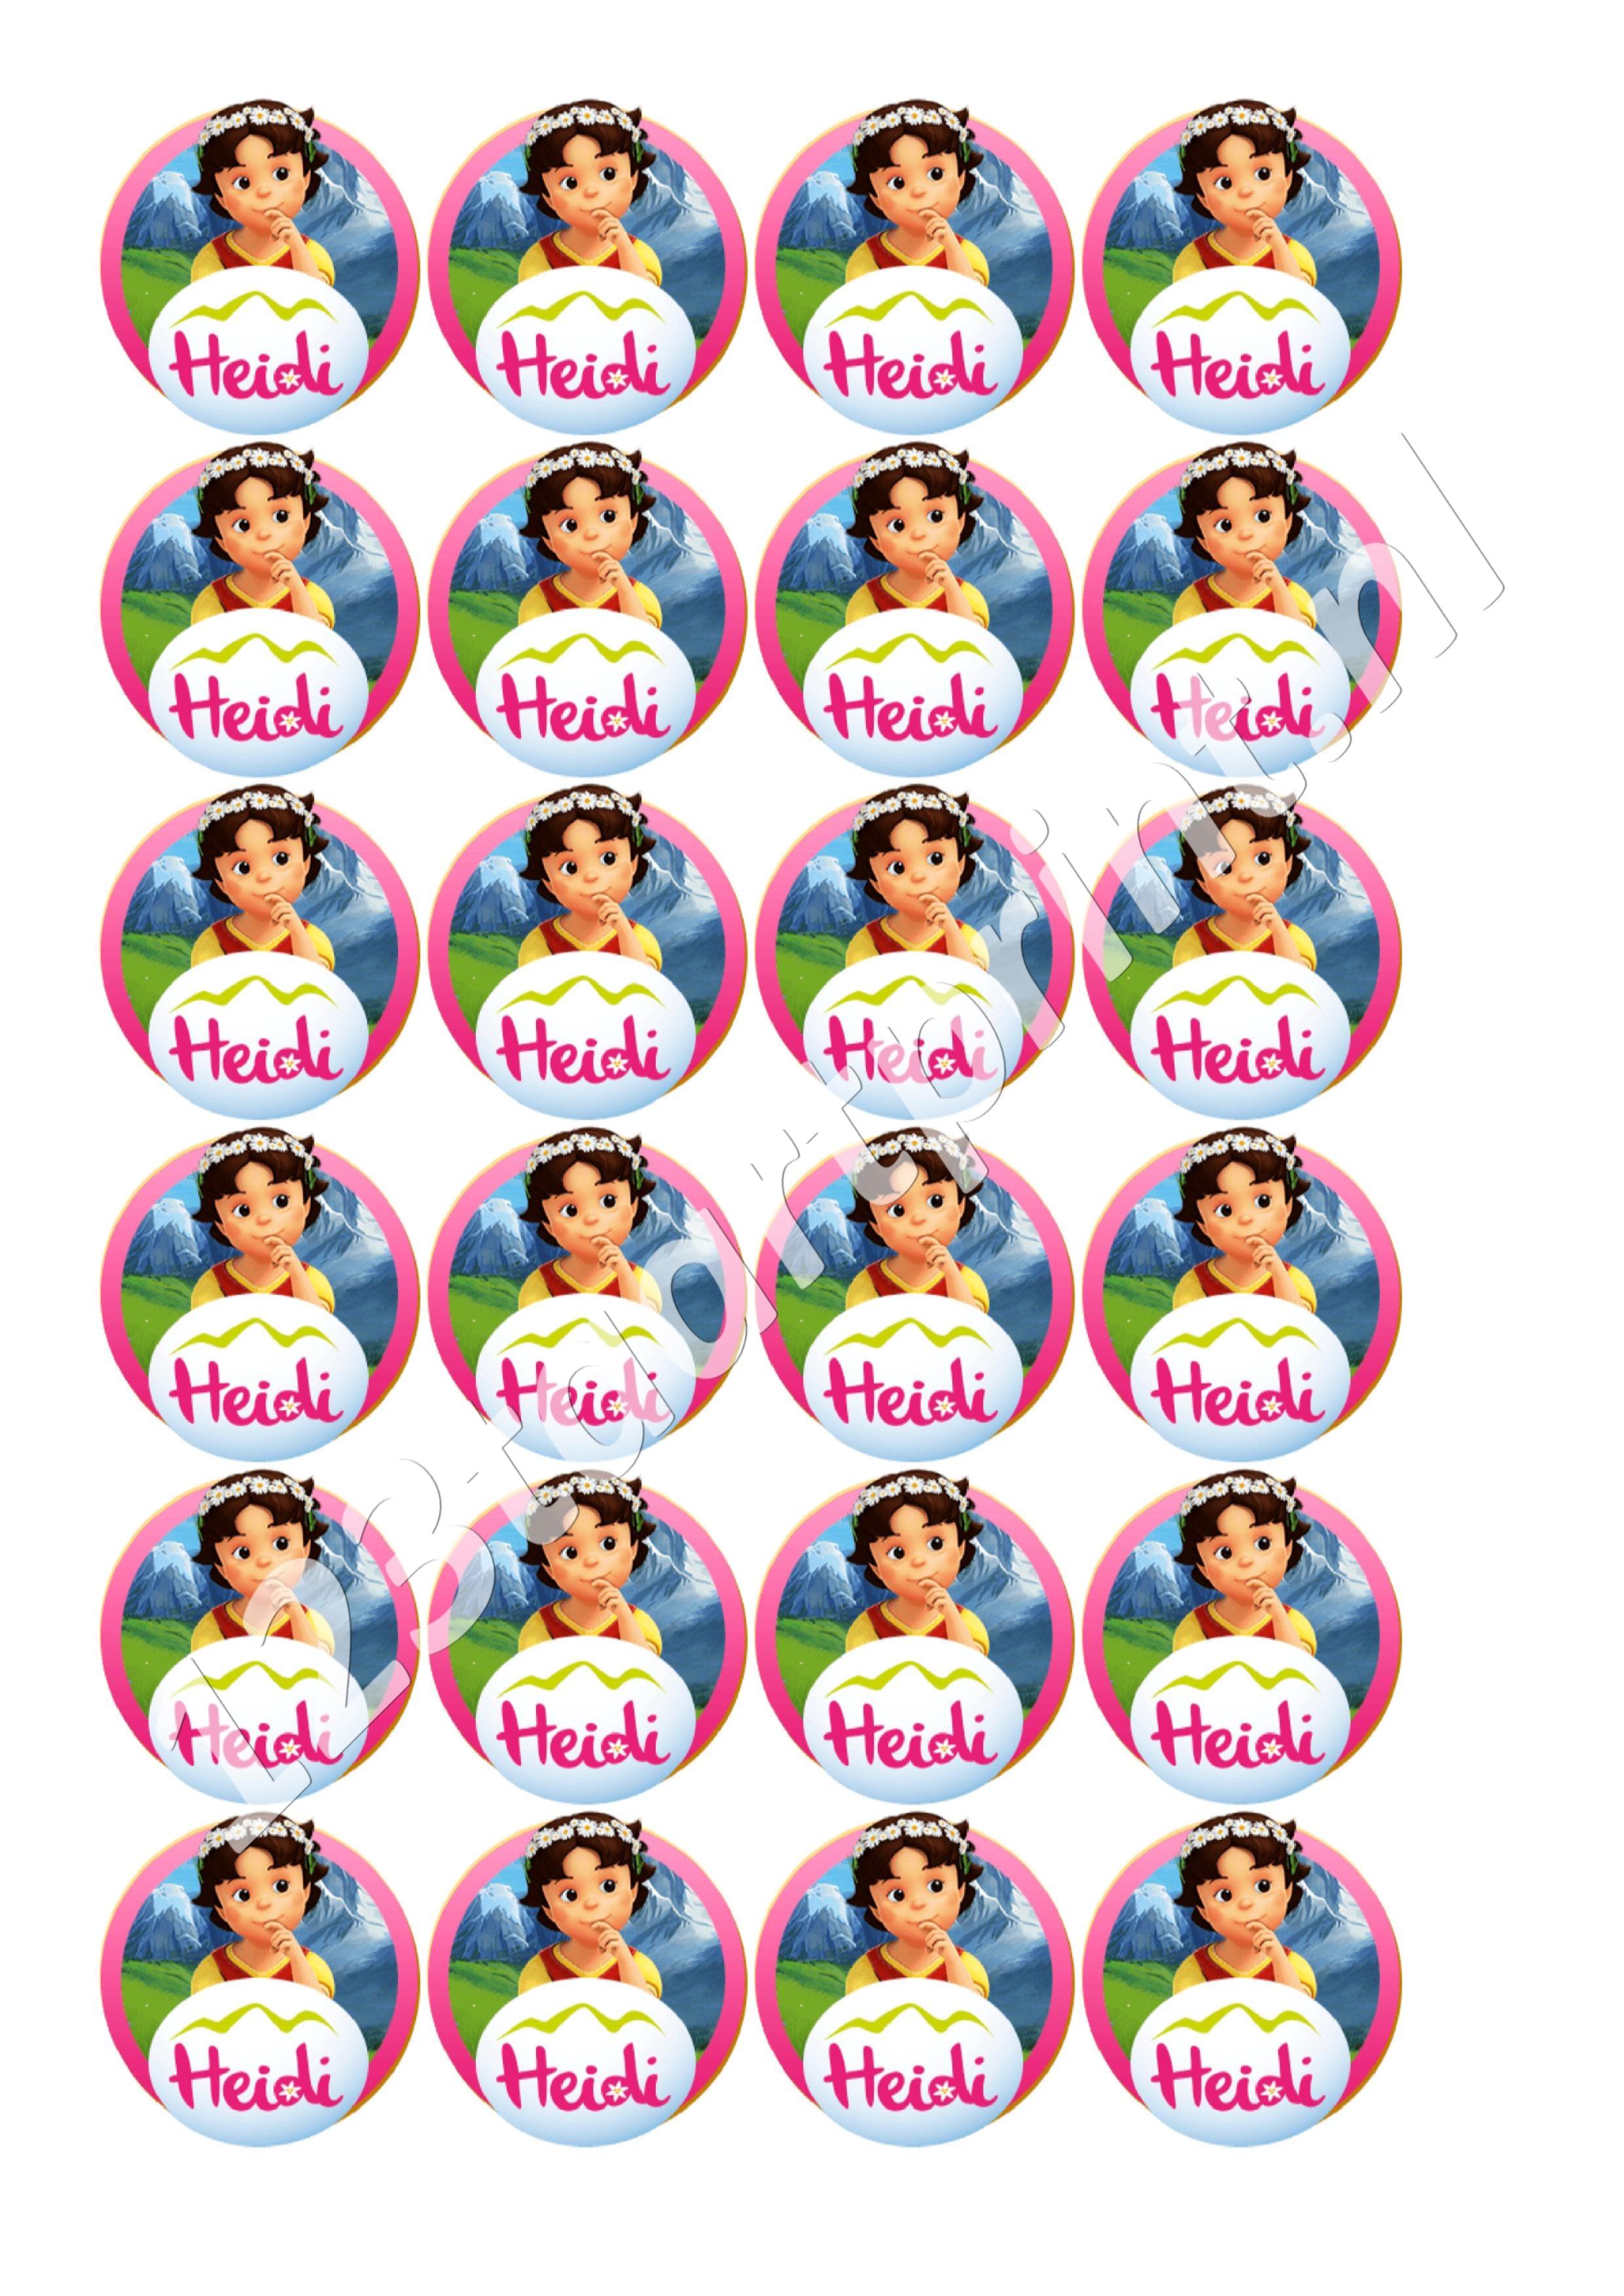 Heidi rond 3 cupcakes